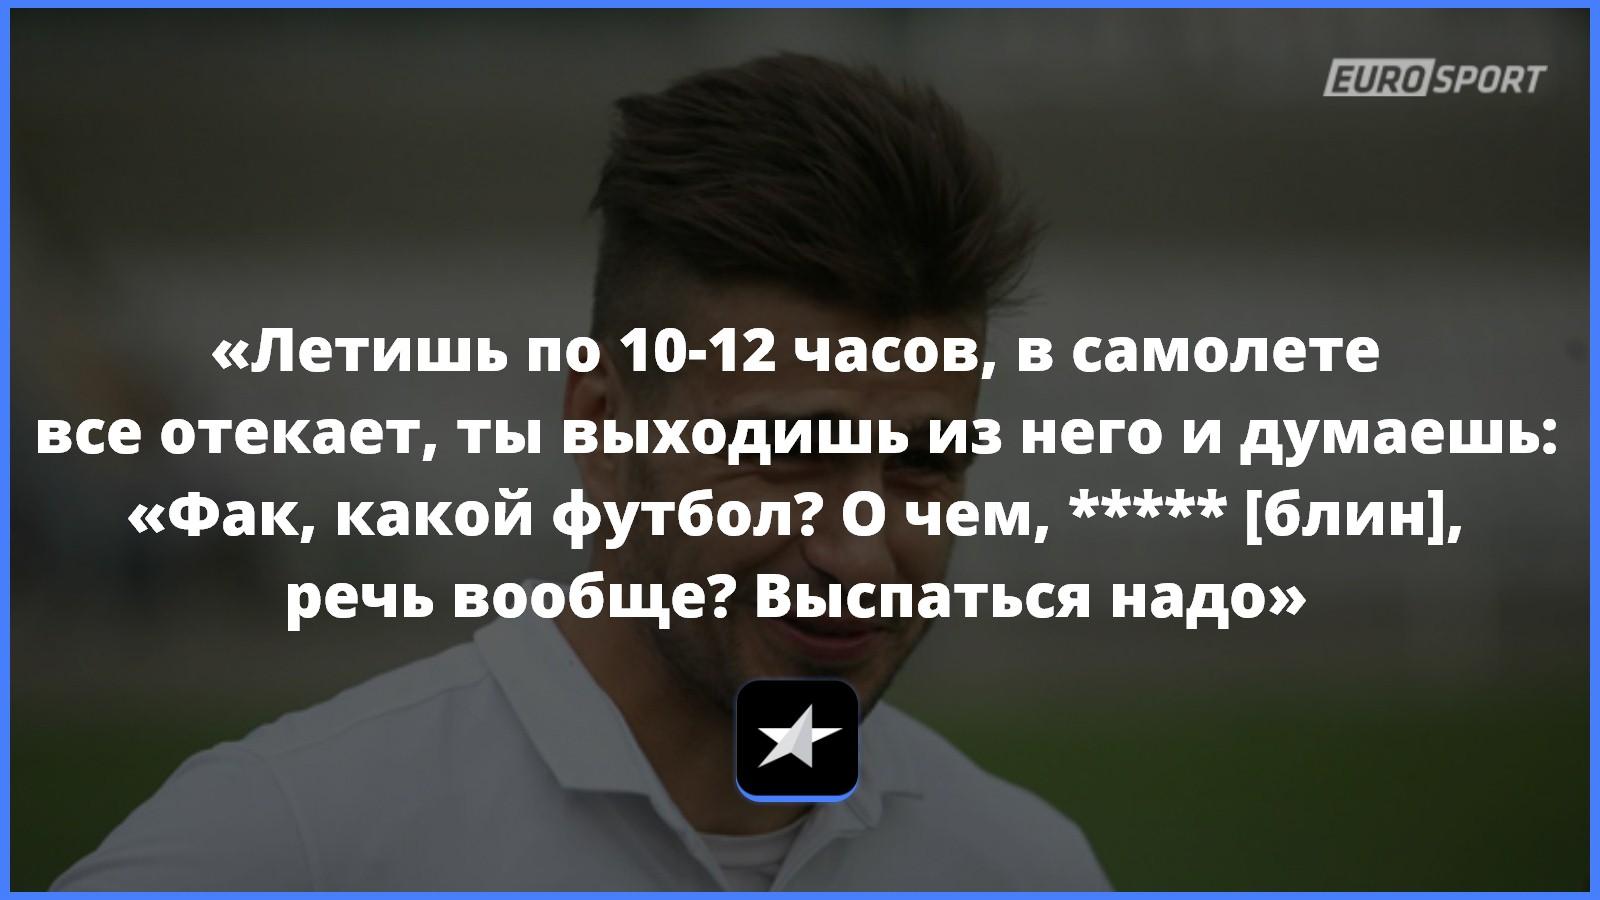 https://i.eurosport.com/2015/08/13/1659385.jpg